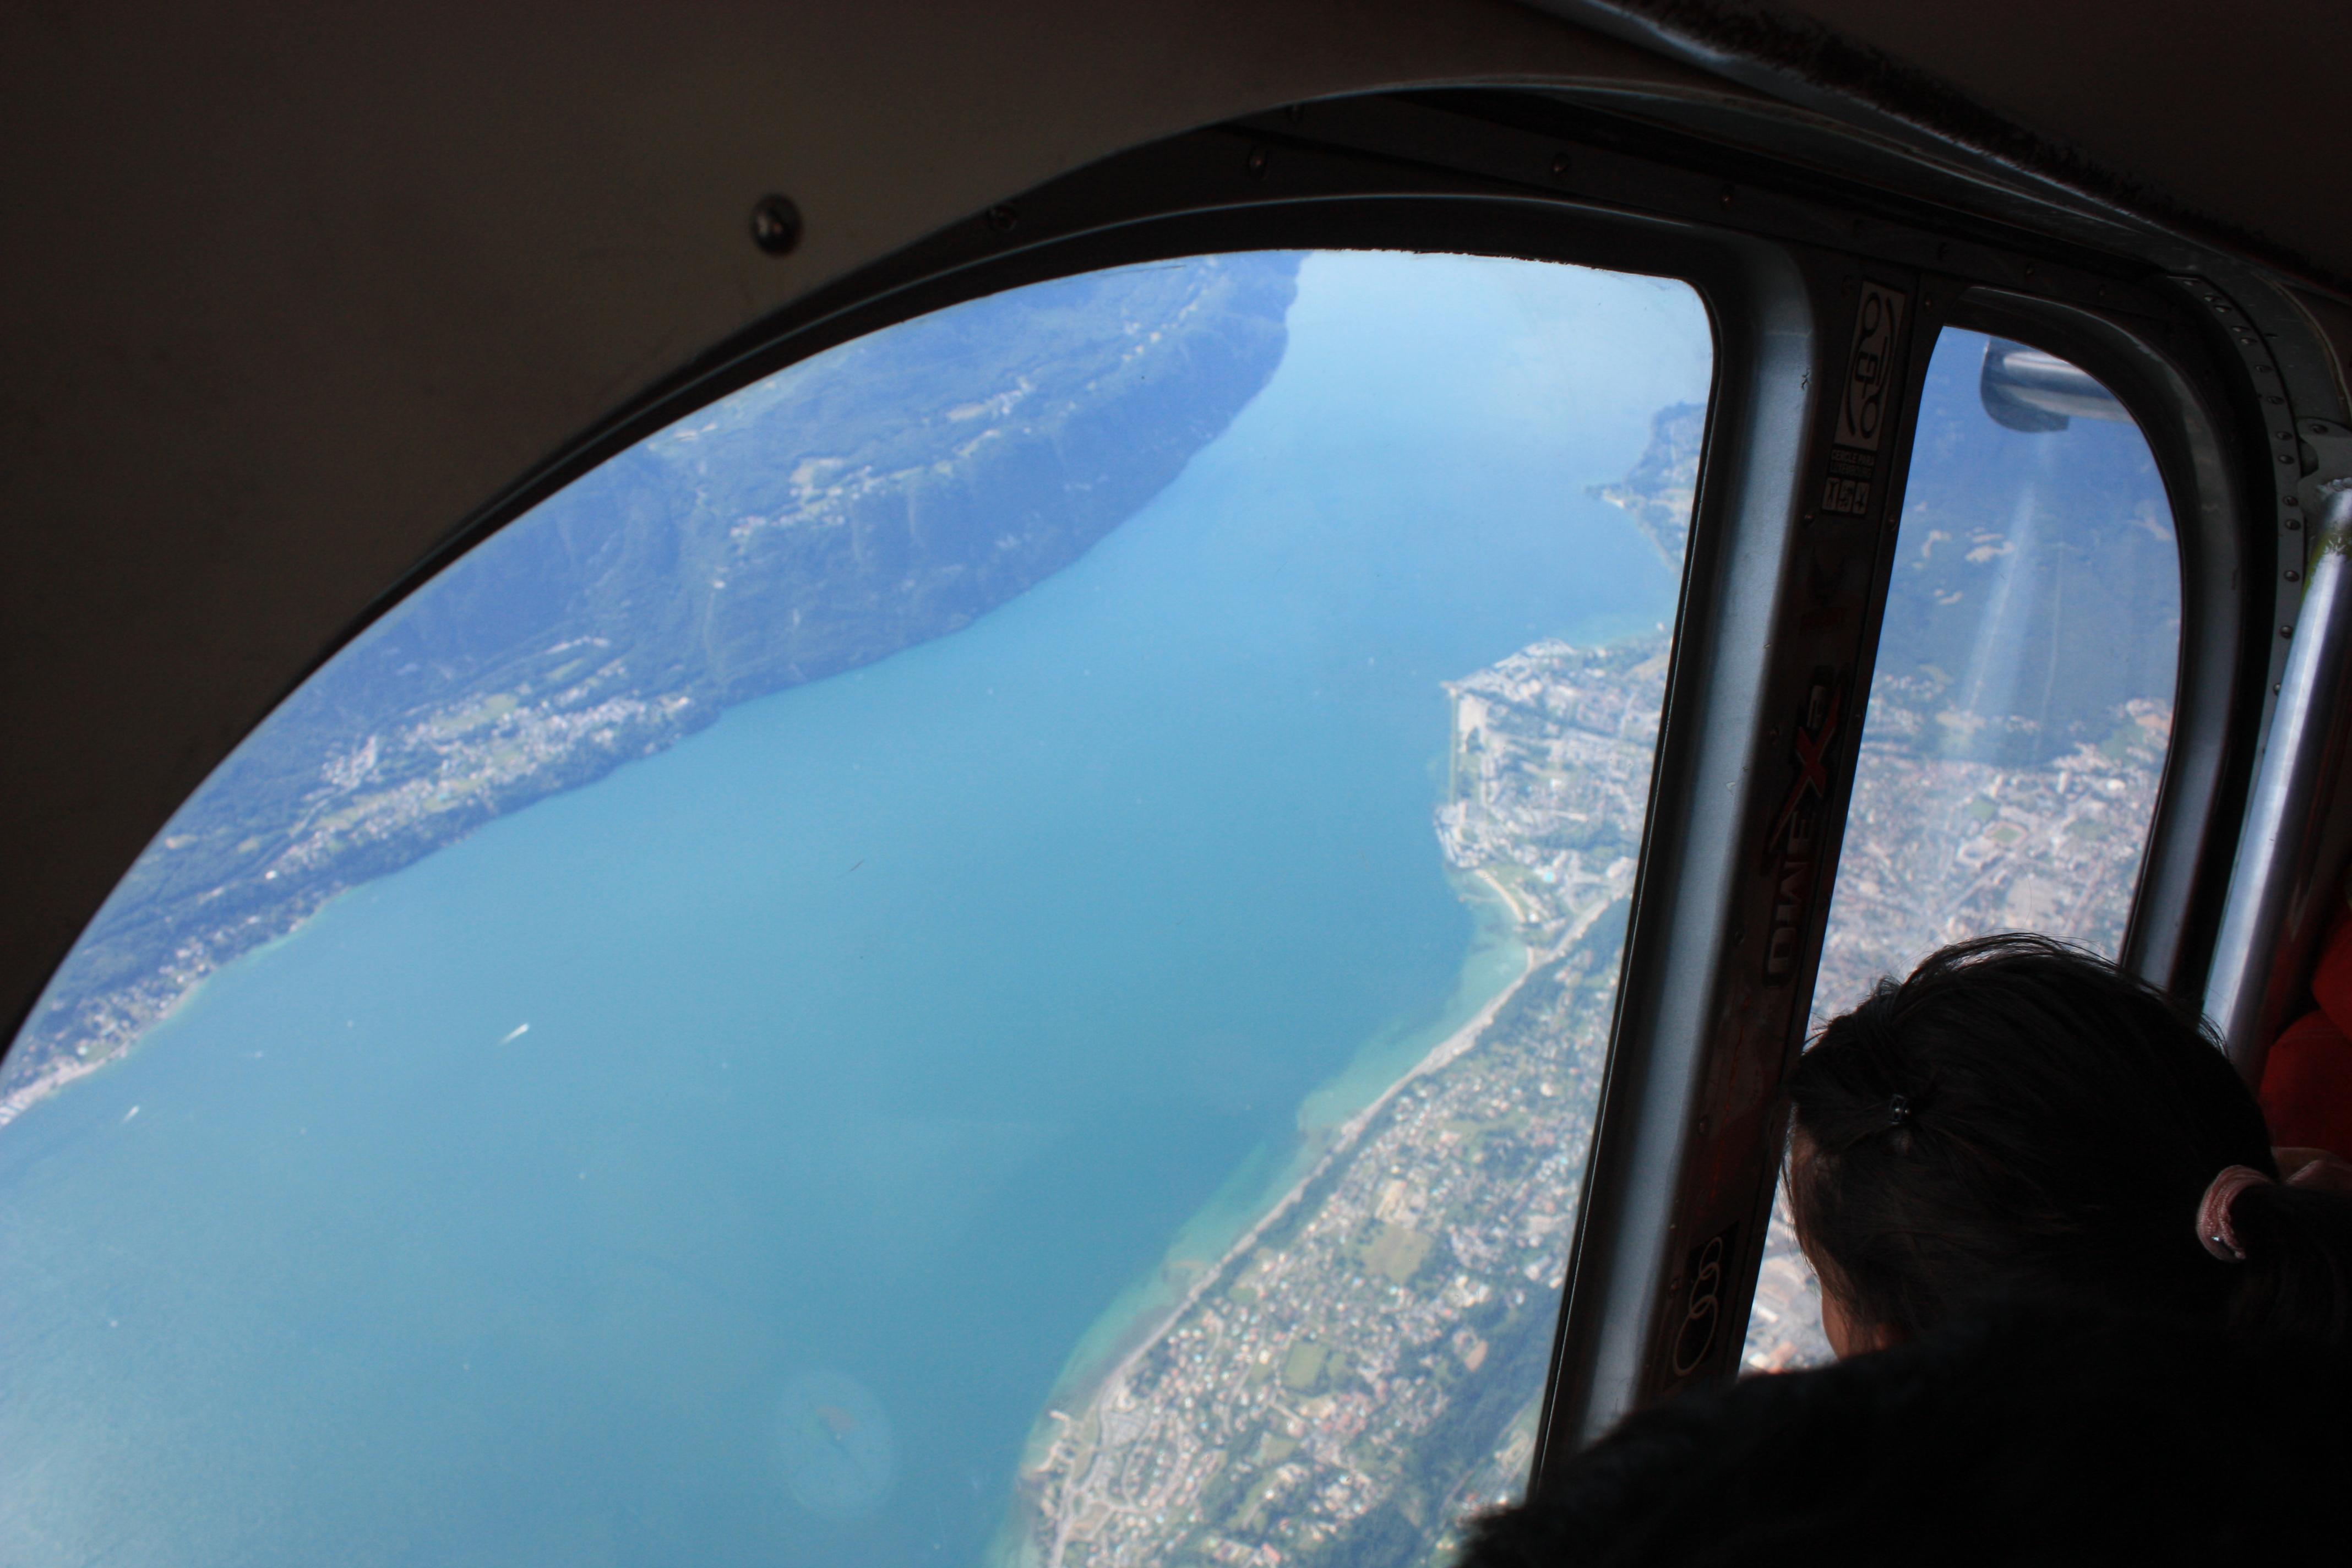 Montée en avion à Chambery